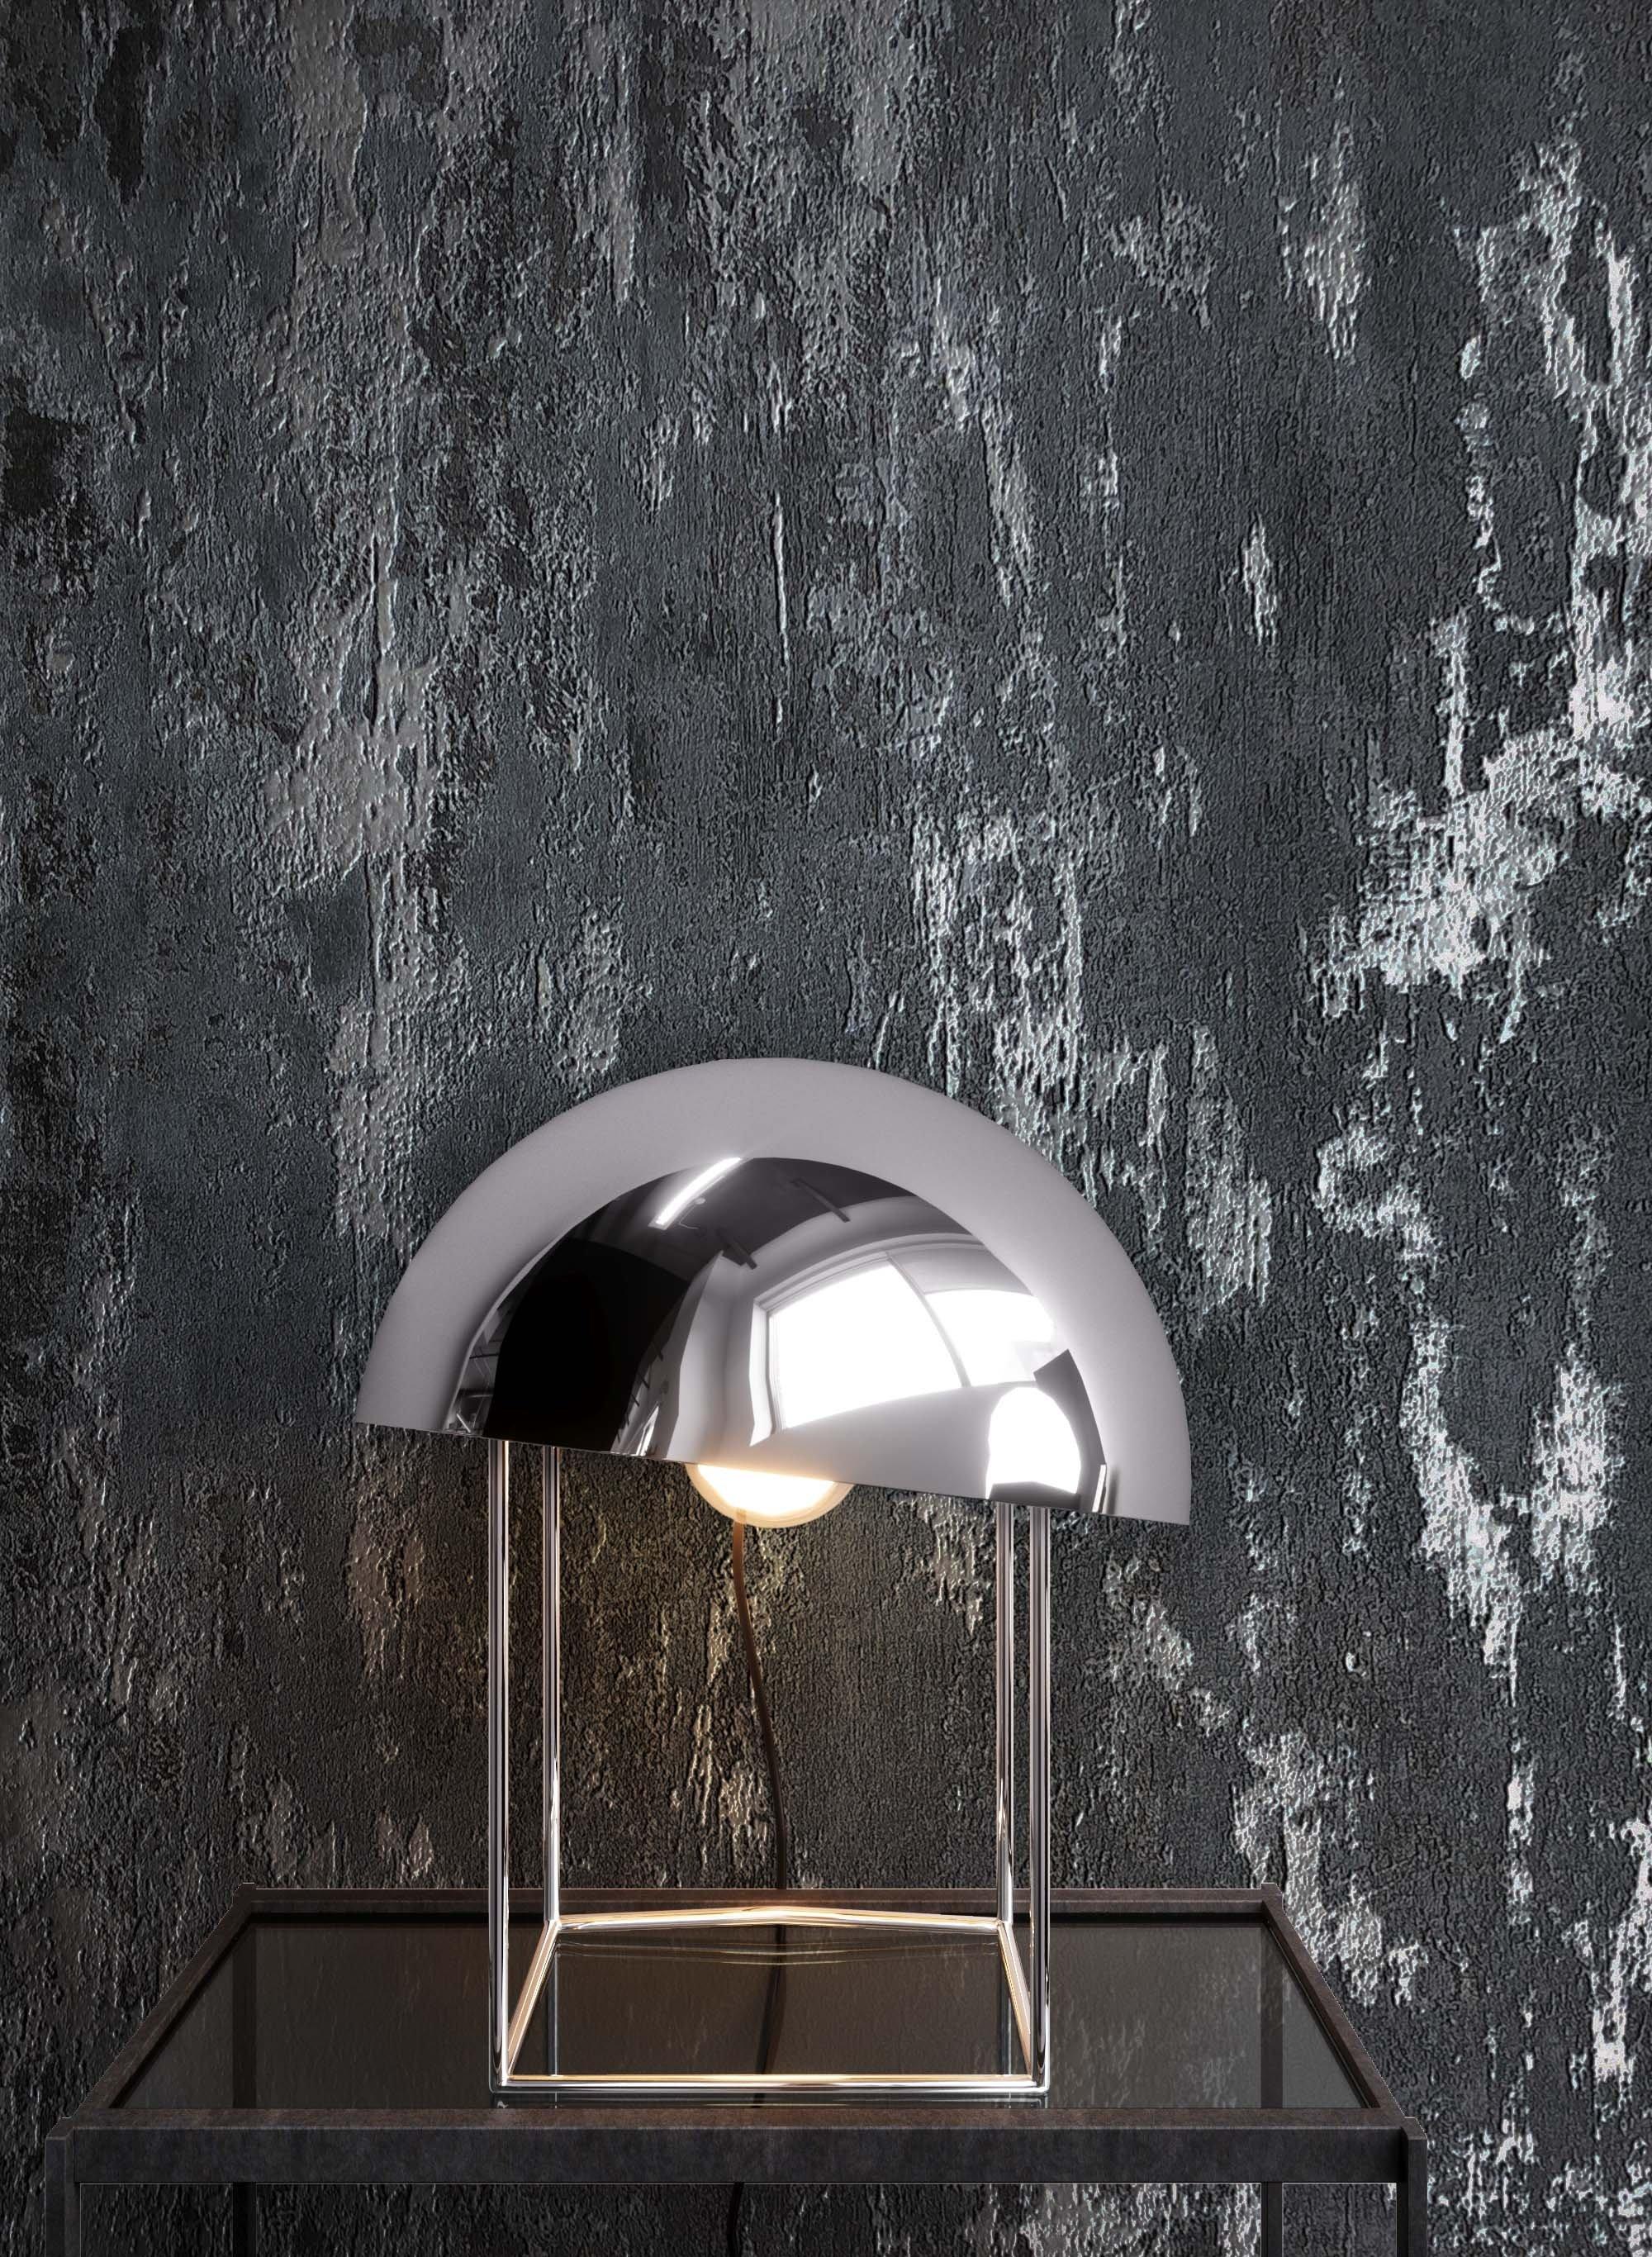 Elegant Vliestapete Barock Bestand An Wohndesign Design